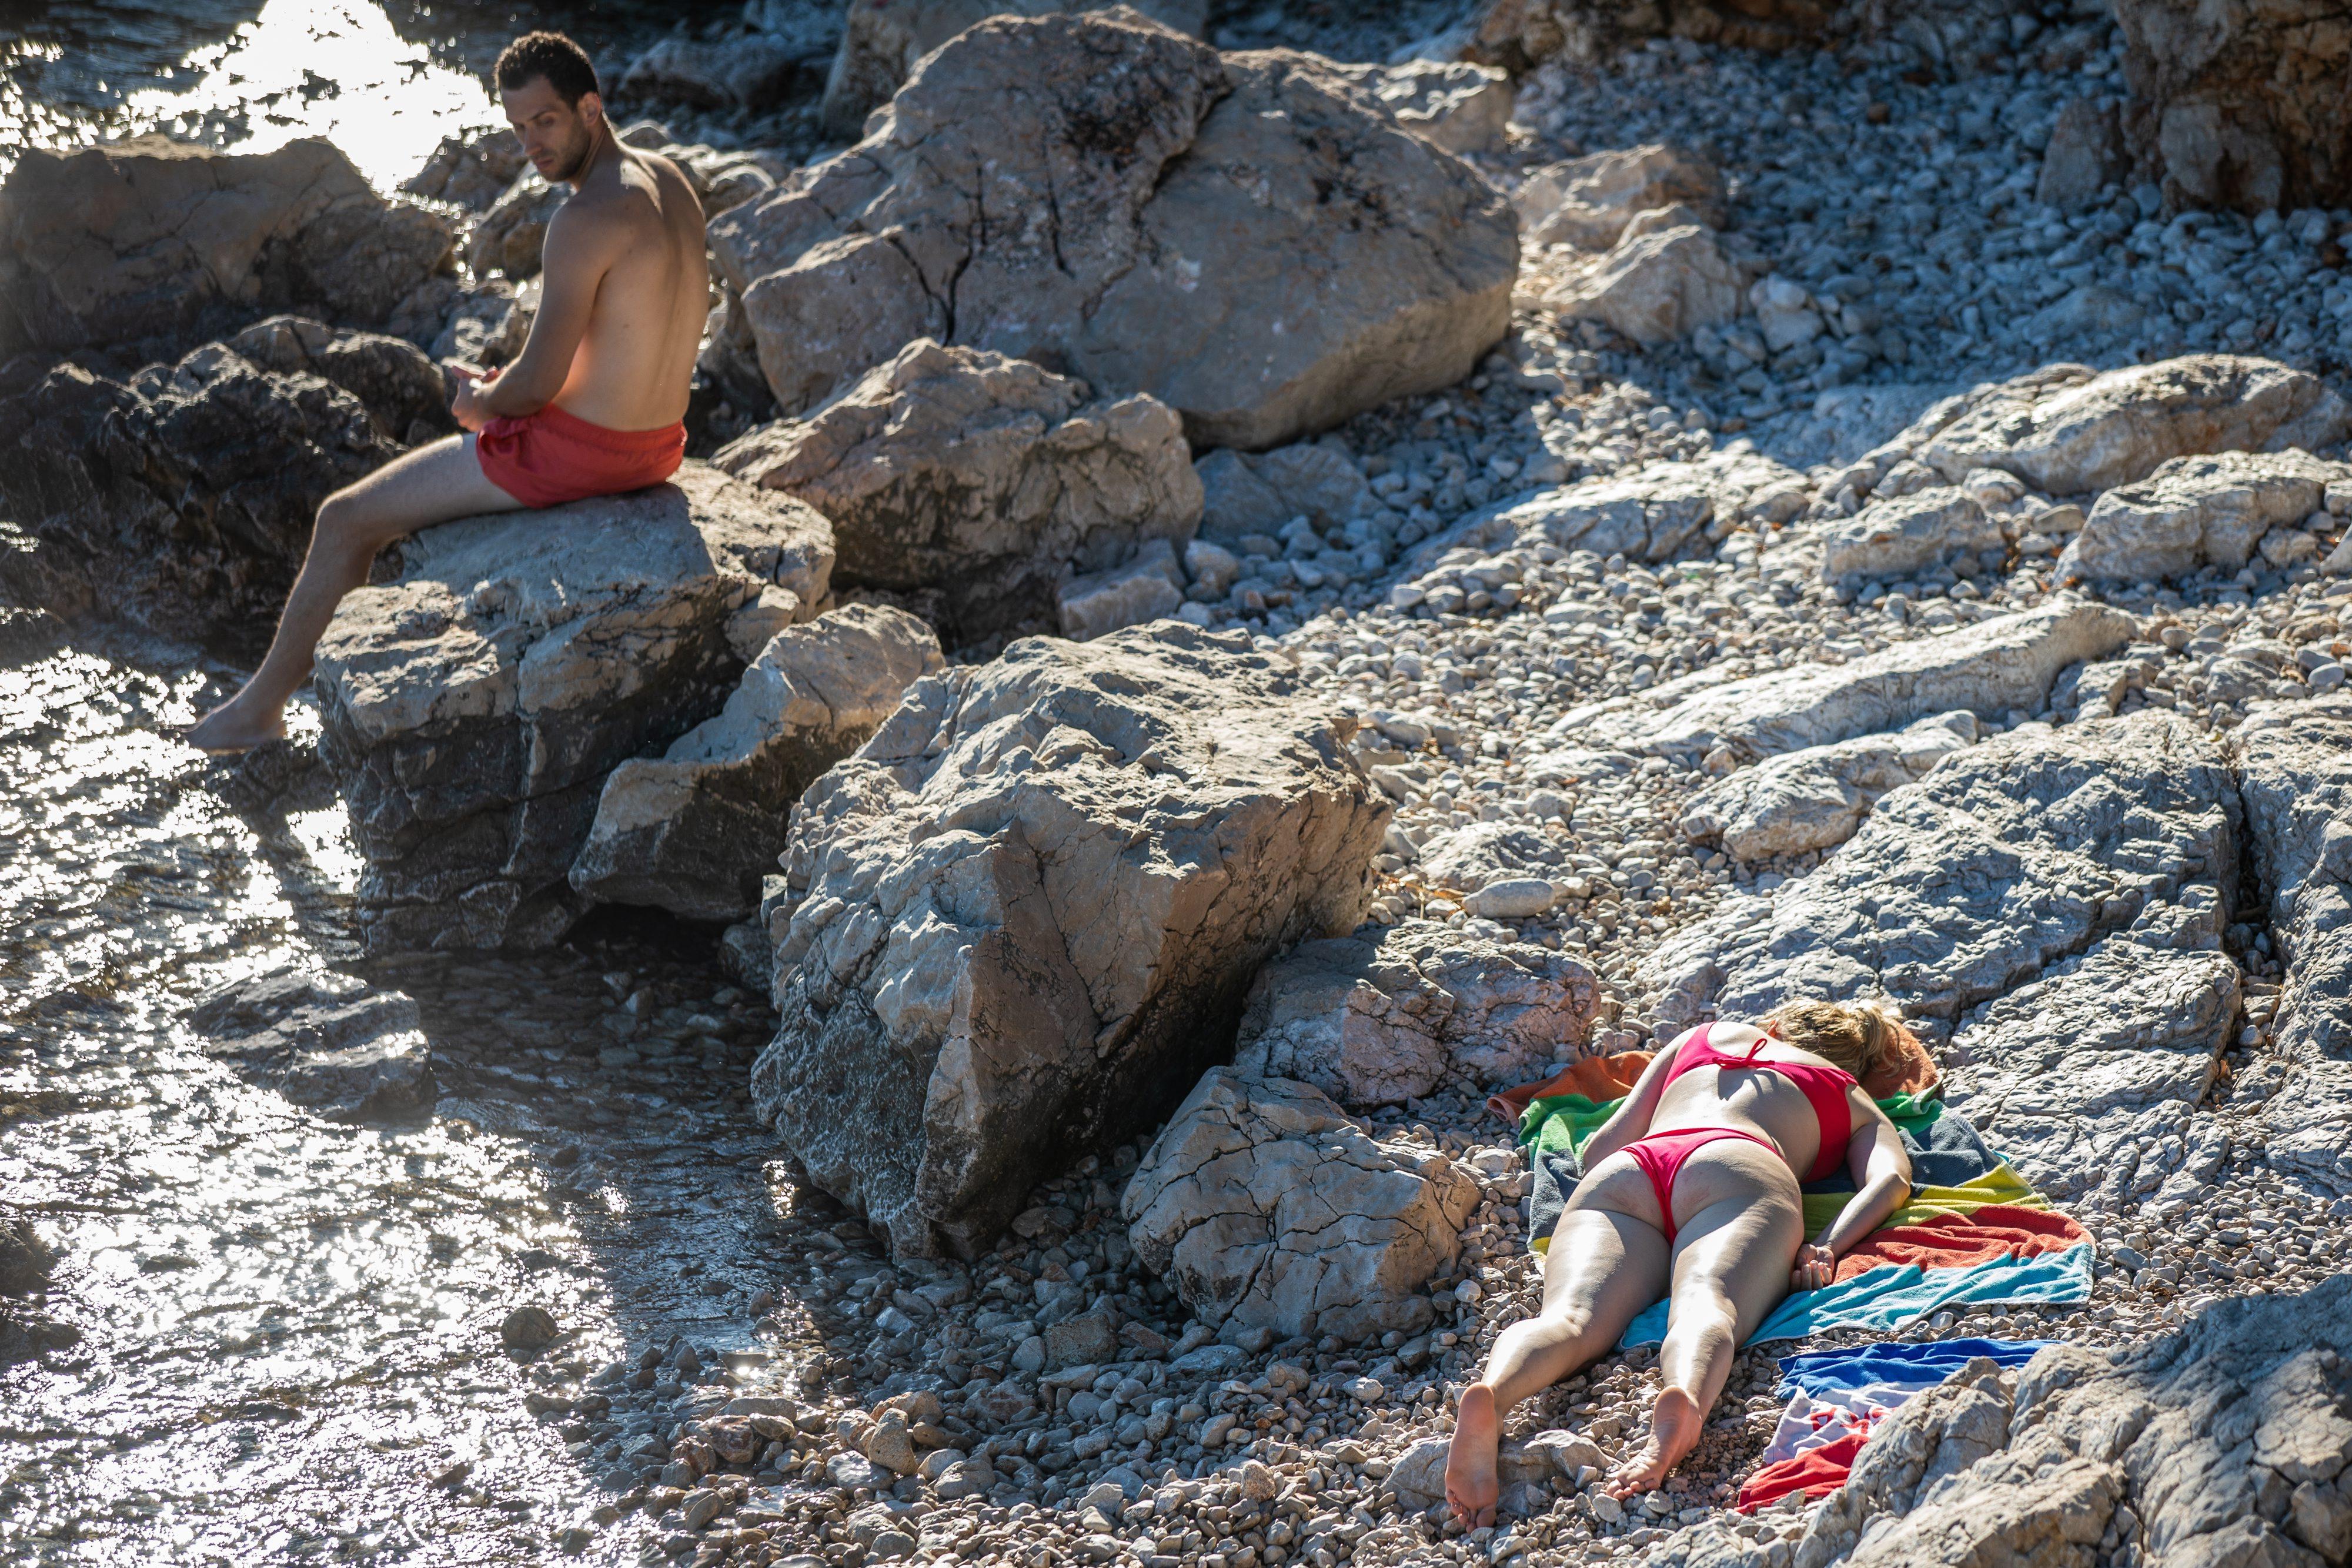 Kostrena, beach, sunbathers